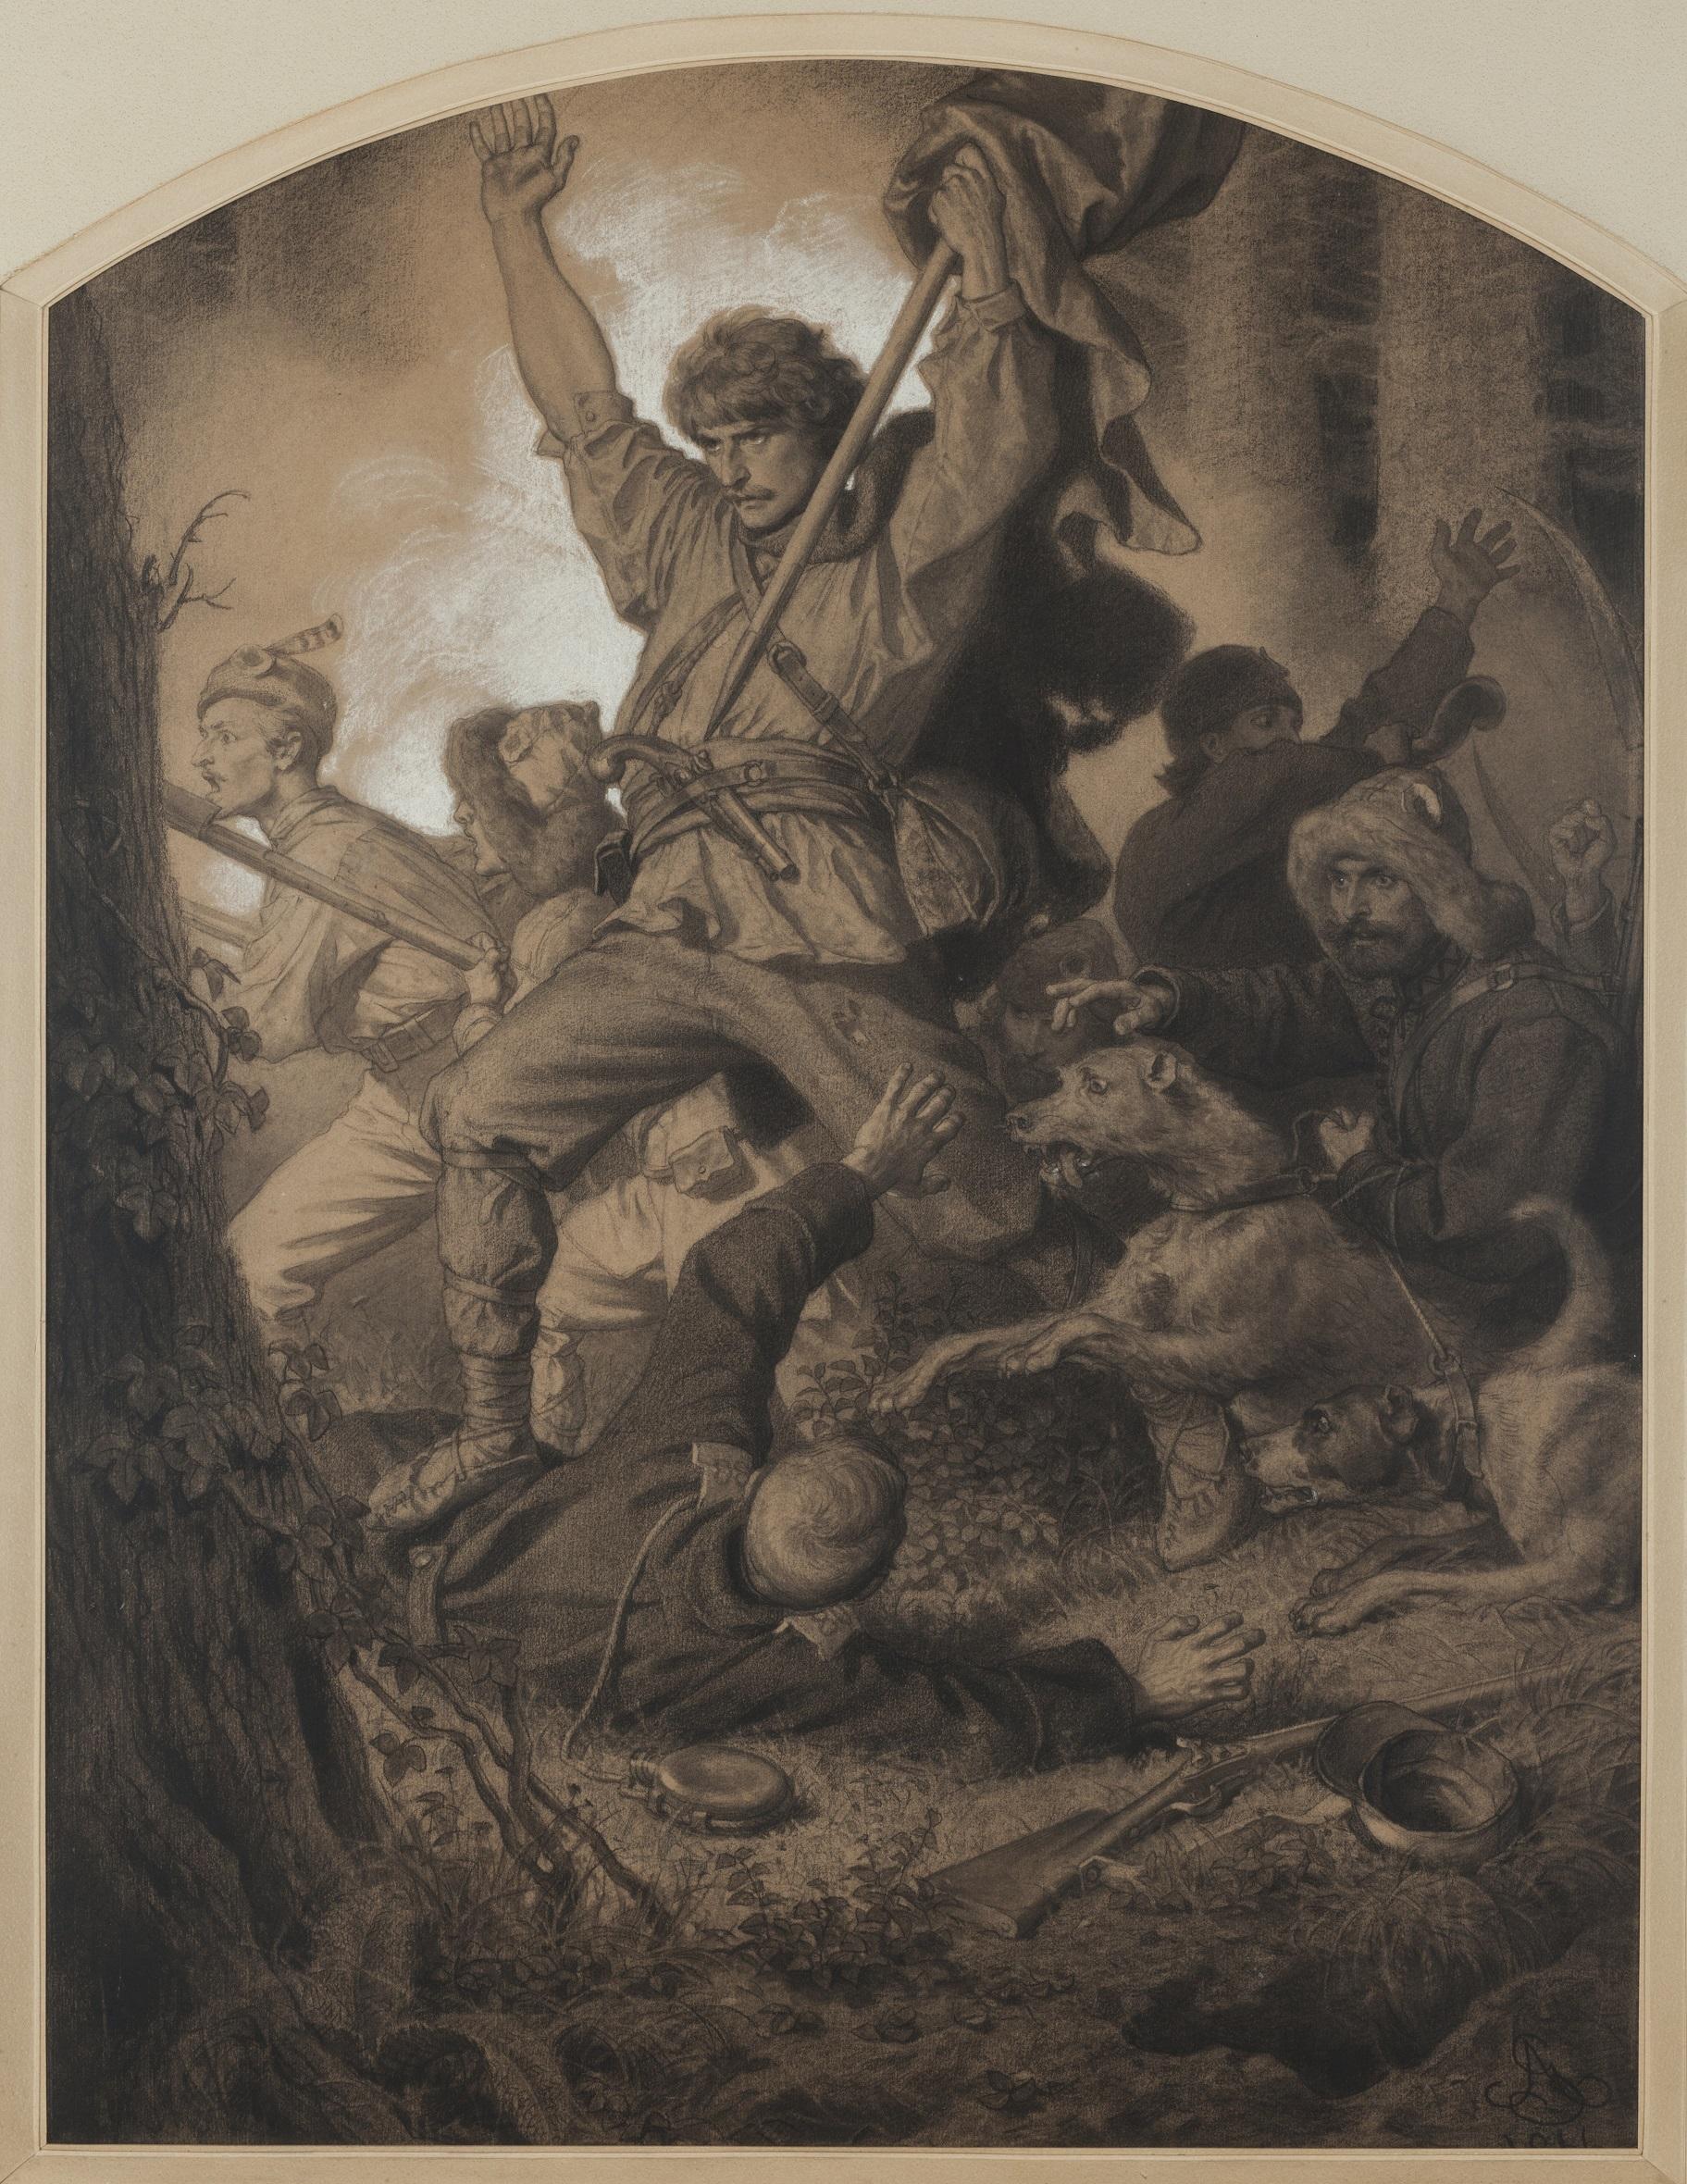 "Artūro Grotgerio (Artur Grottger) ciklas ""Lituania"". Mūšis. 1866 m. | Krokuvos nacionalinio muziejaus nuotr."